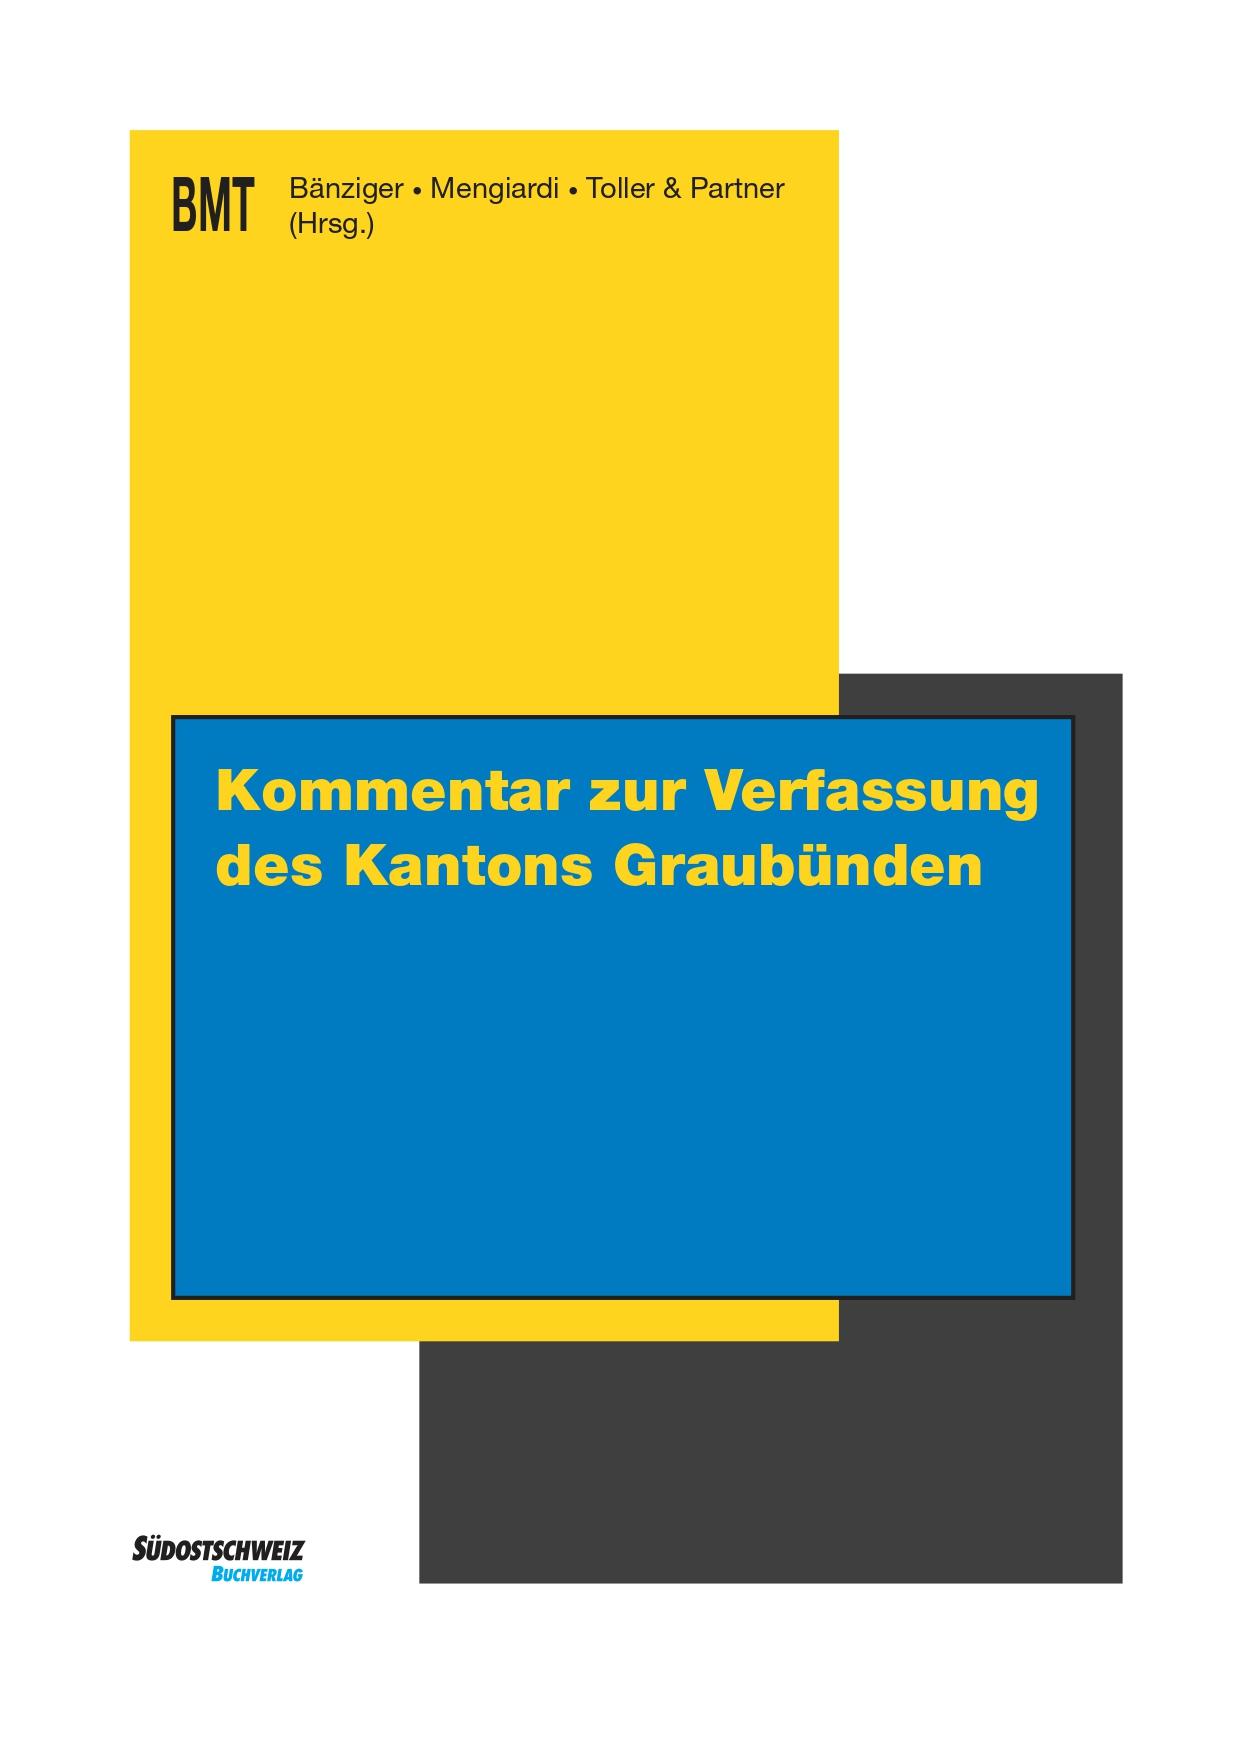 download Duale Reihe: Dermatologie 2005